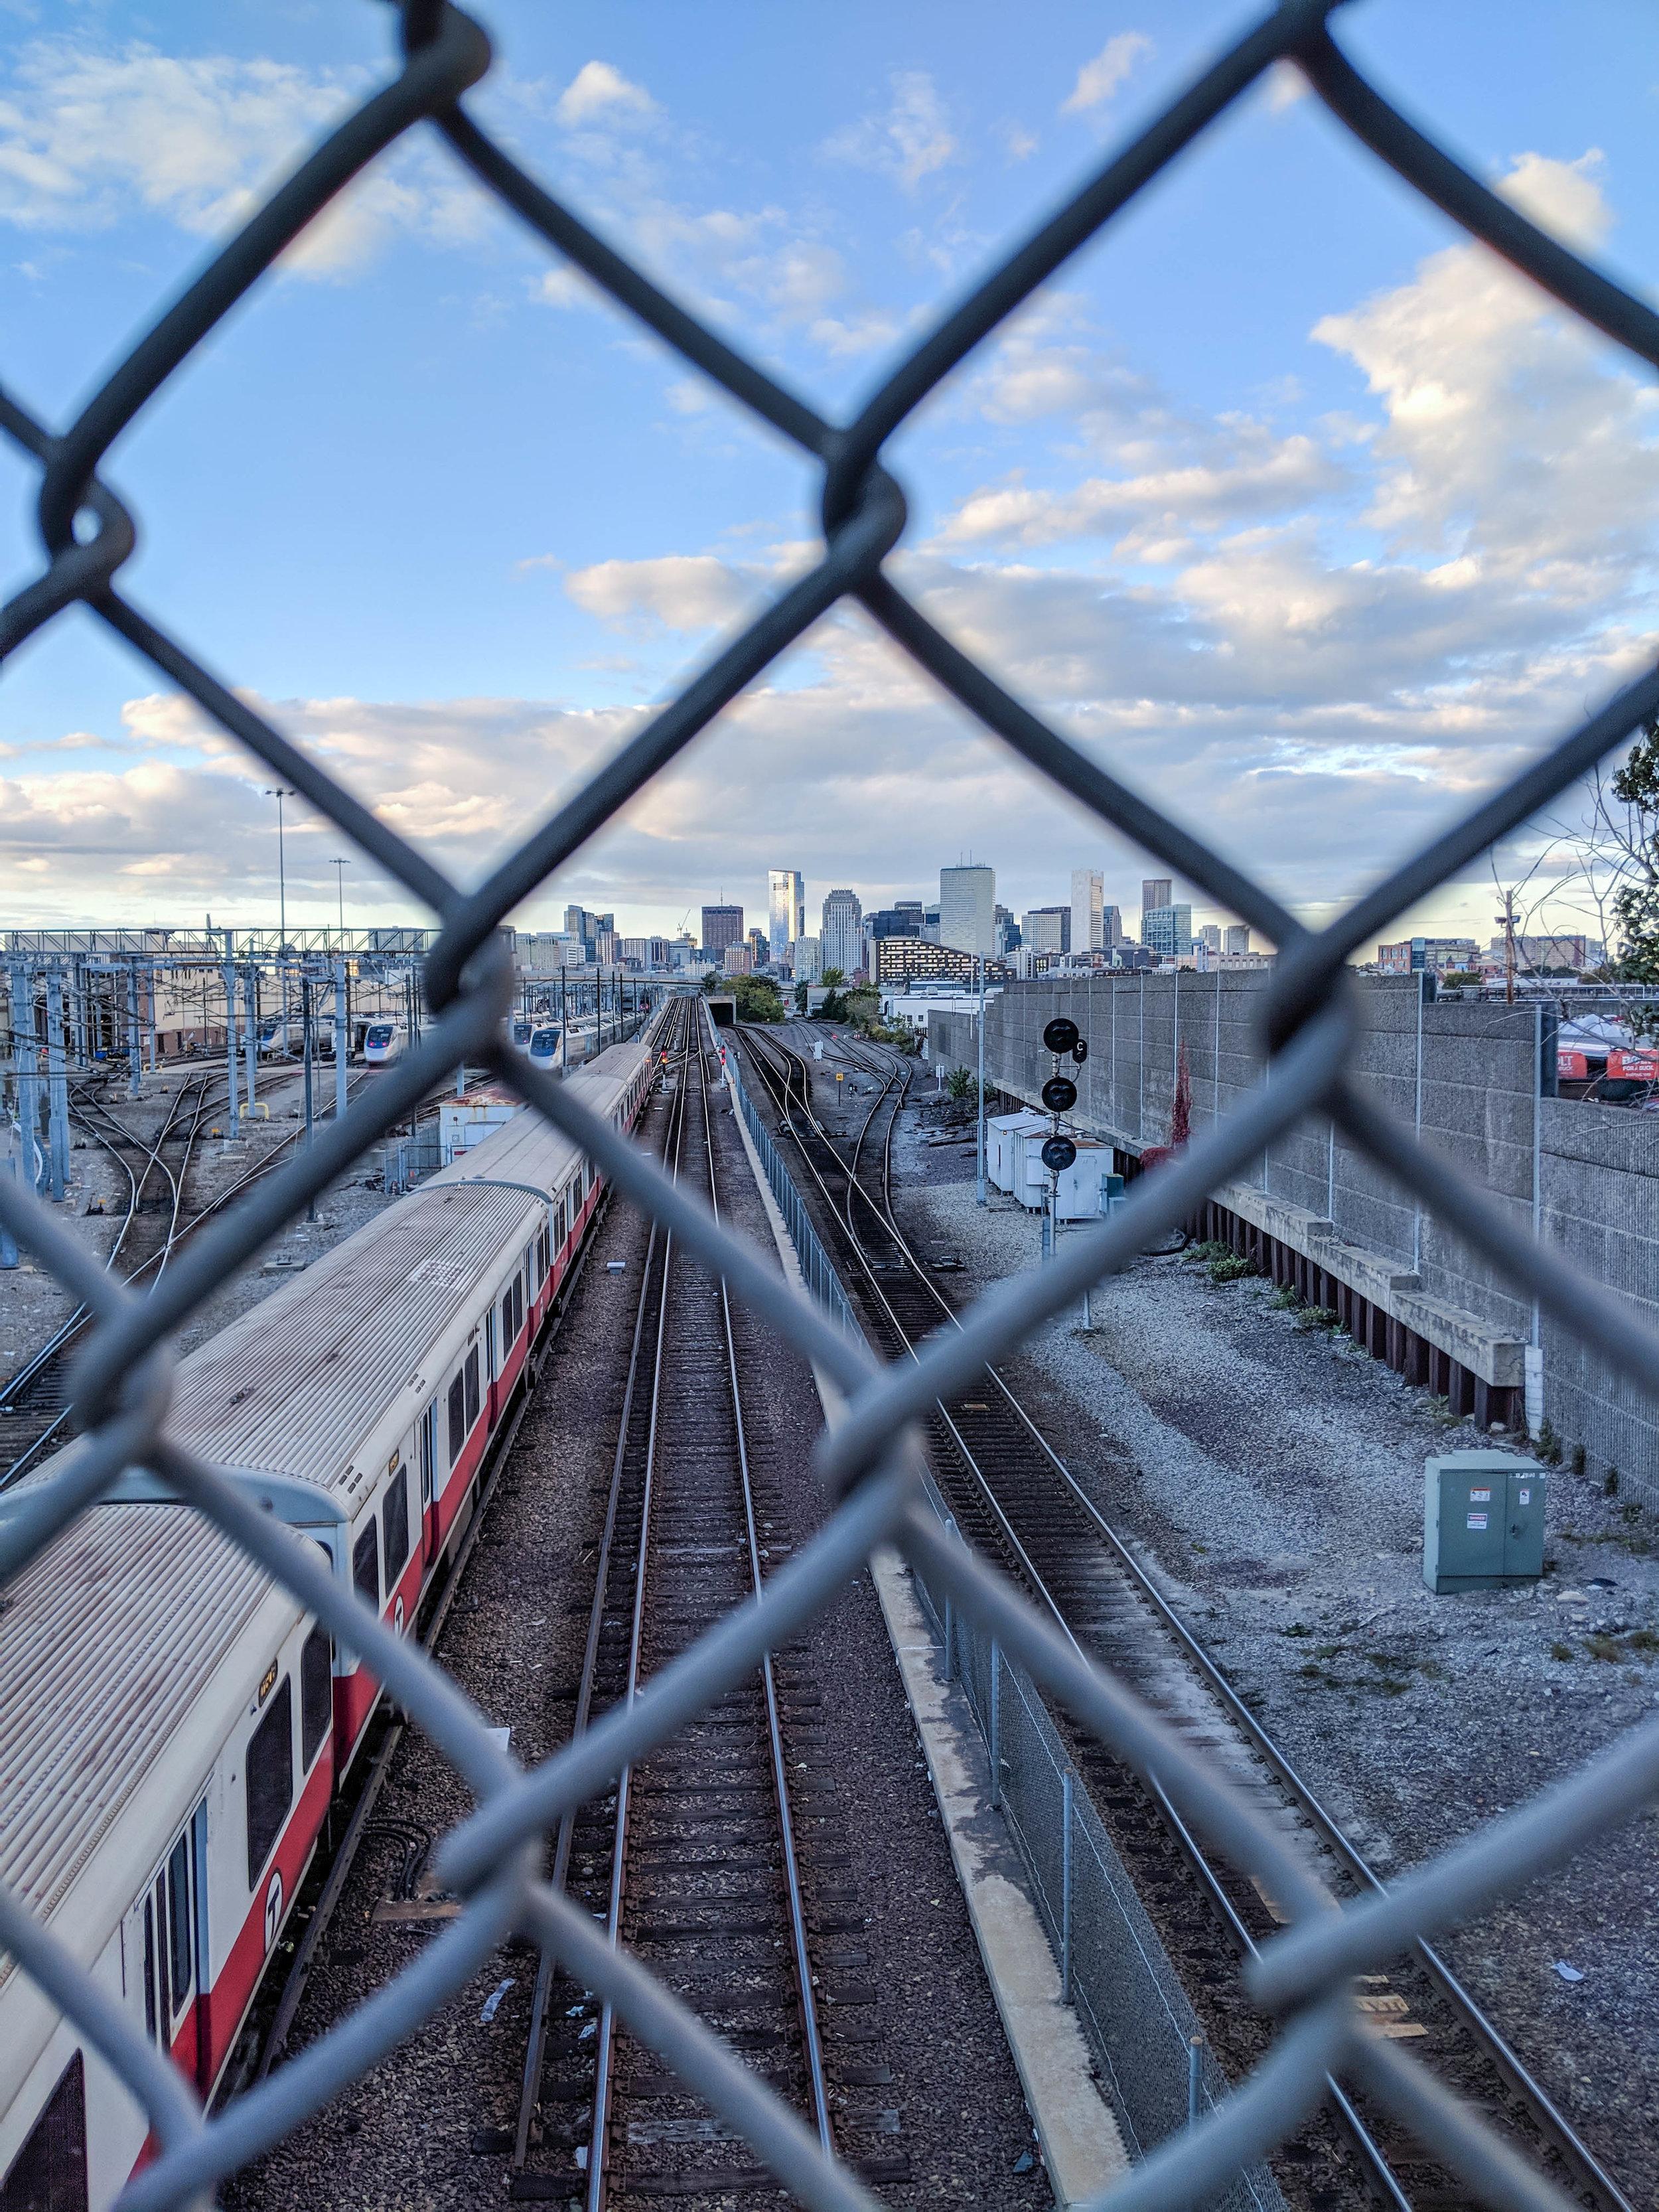 bri rinehart; photography; boston; train; skyline